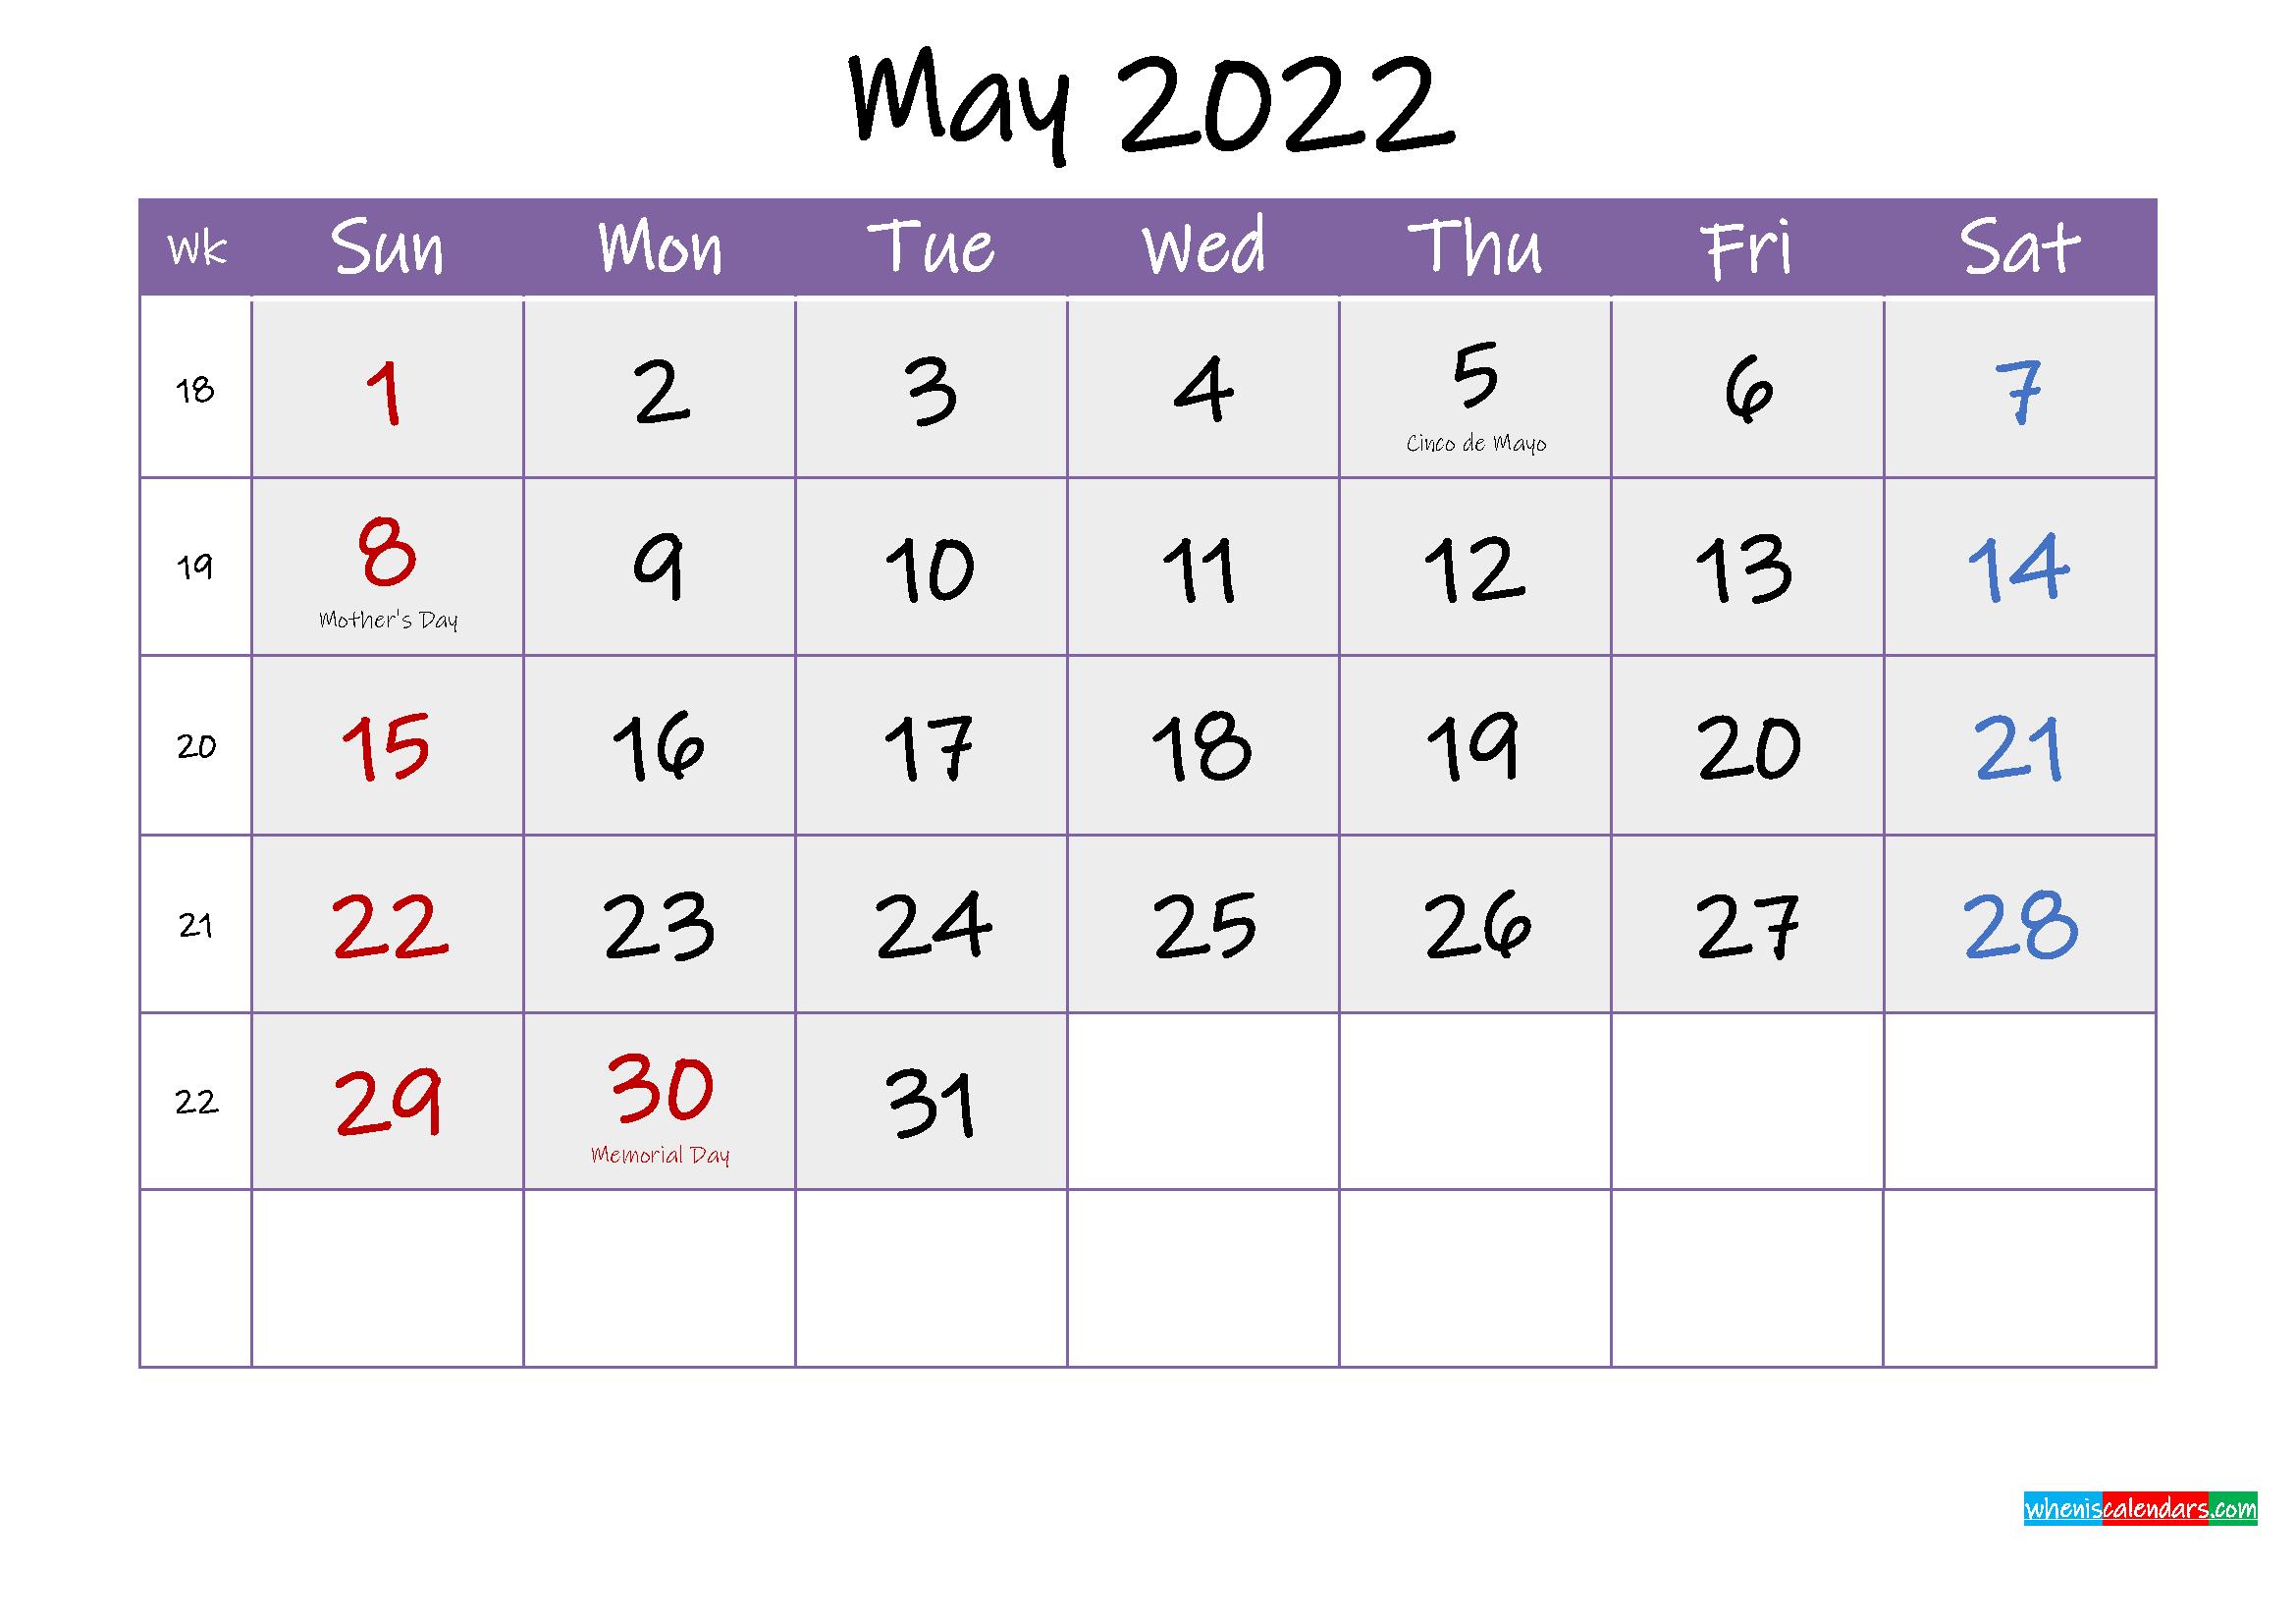 Free May 2022 Printable Calendar With Holidays - Template with May 2022 Calendar Printable